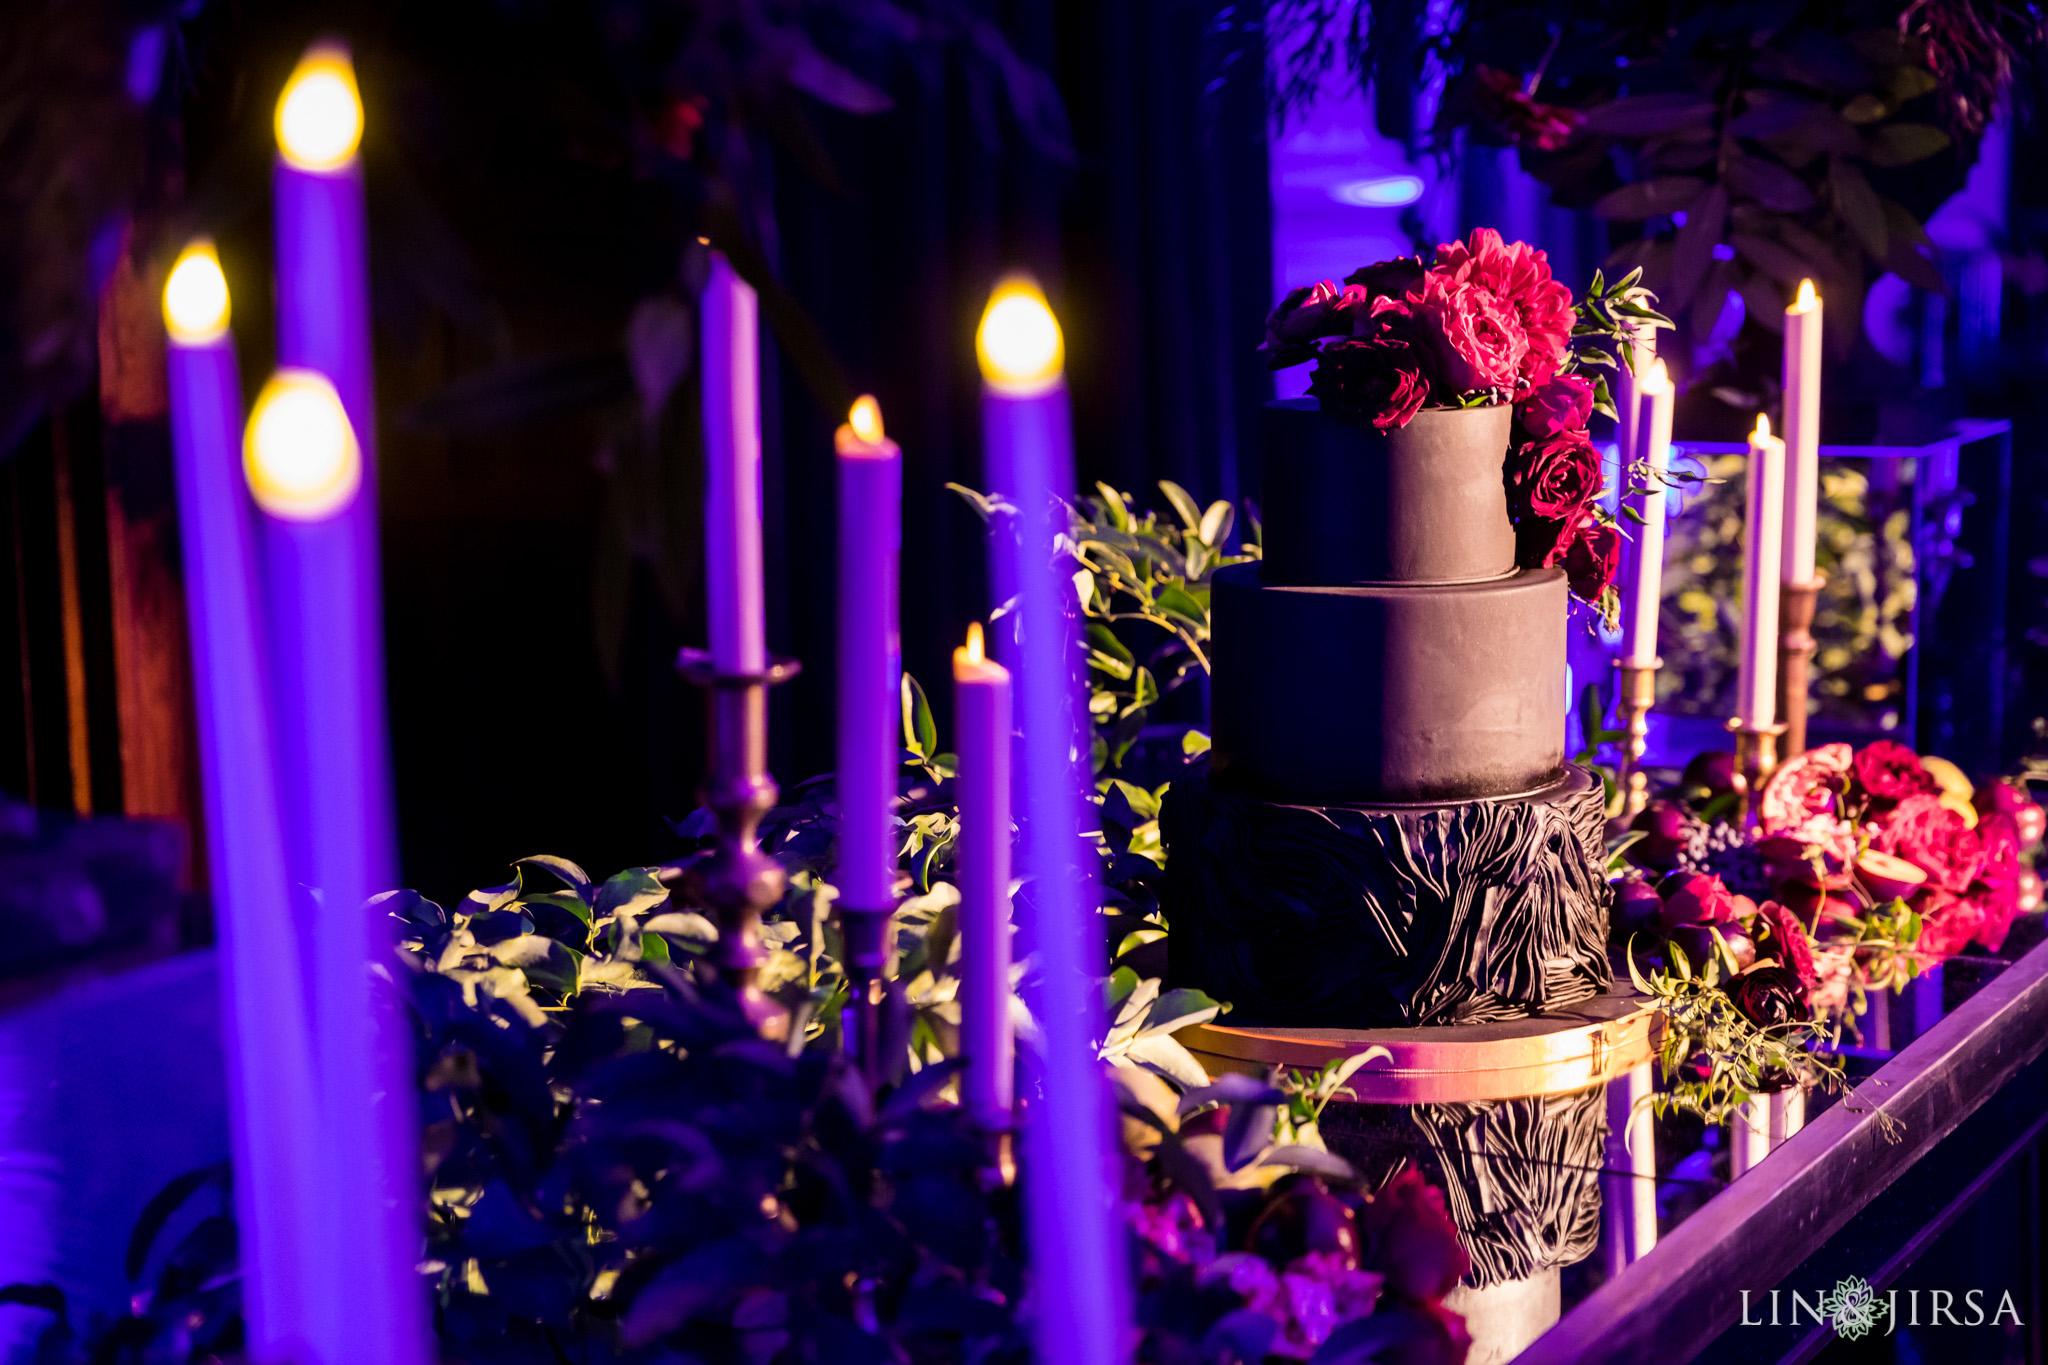 Image by Pye of Lin and Jirsa Photography (www.linandjirsa.com)